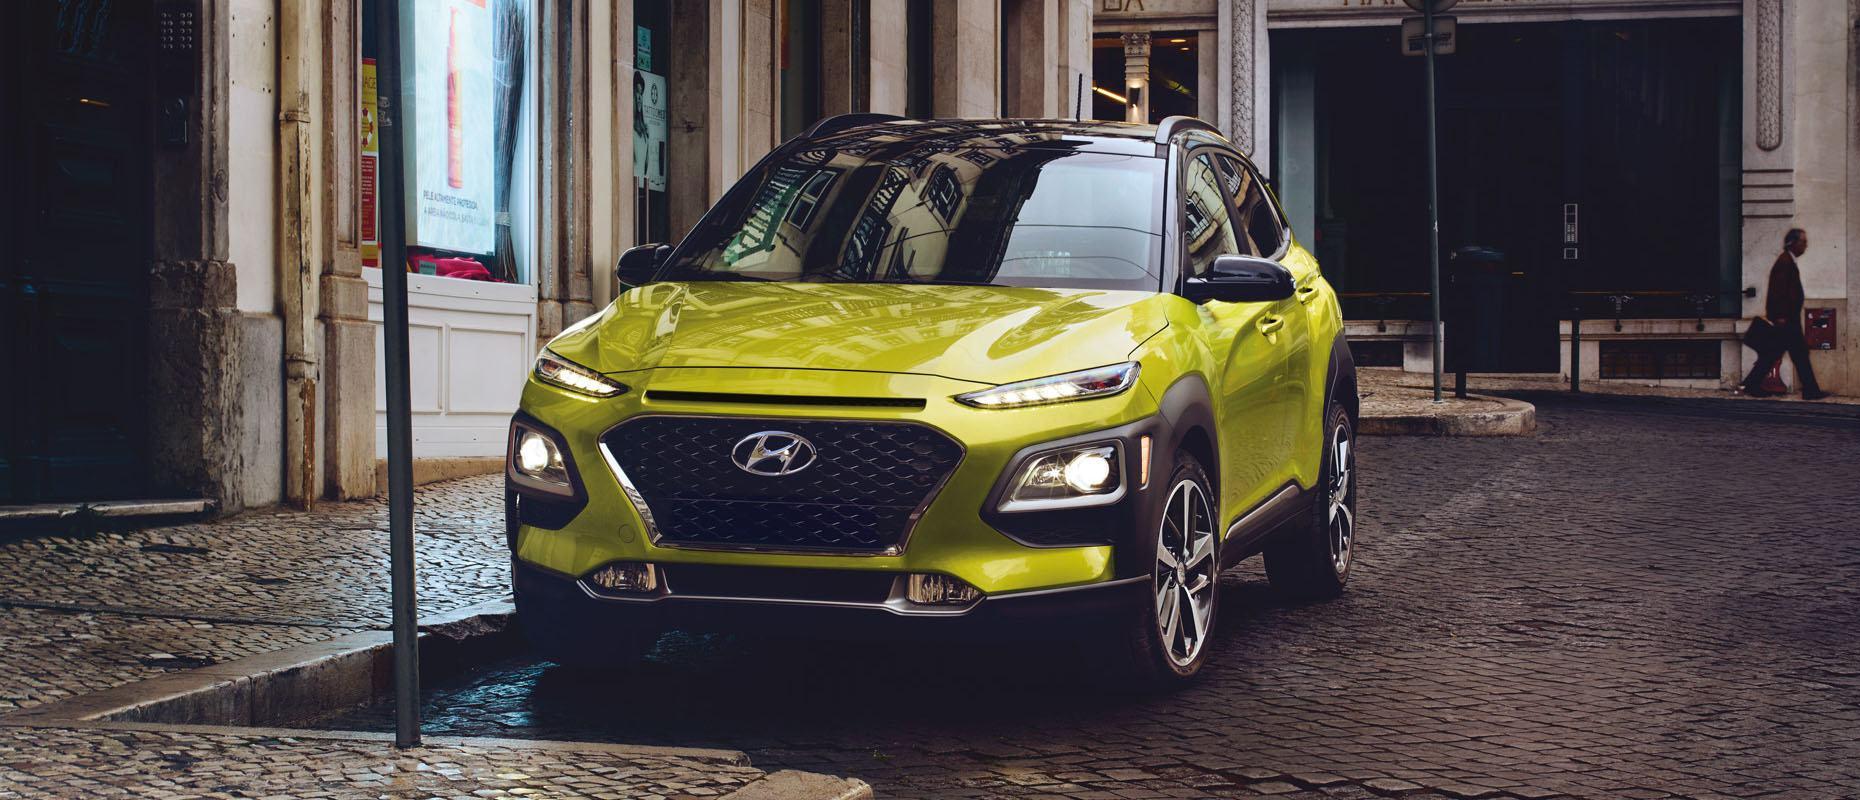 2018 Hyundai Kona Model Header Pathway Hyundai Orleans ON